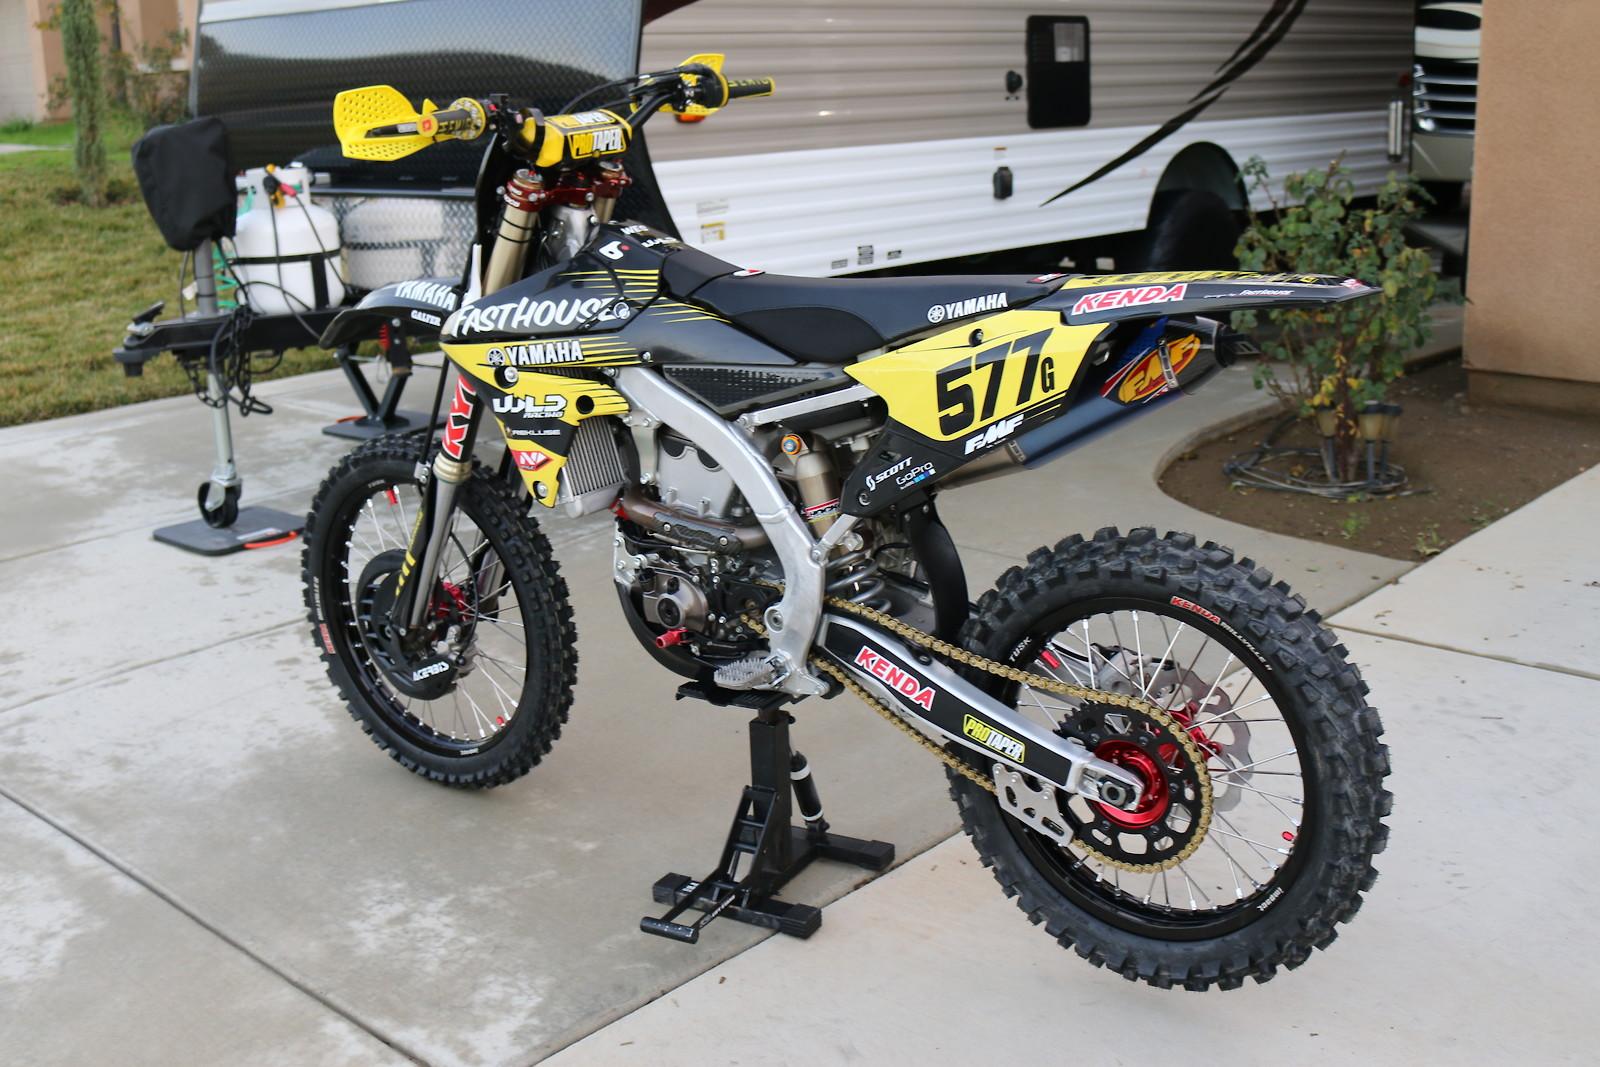 IMG 5895 - WLD - Motocross Pictures - Vital MX